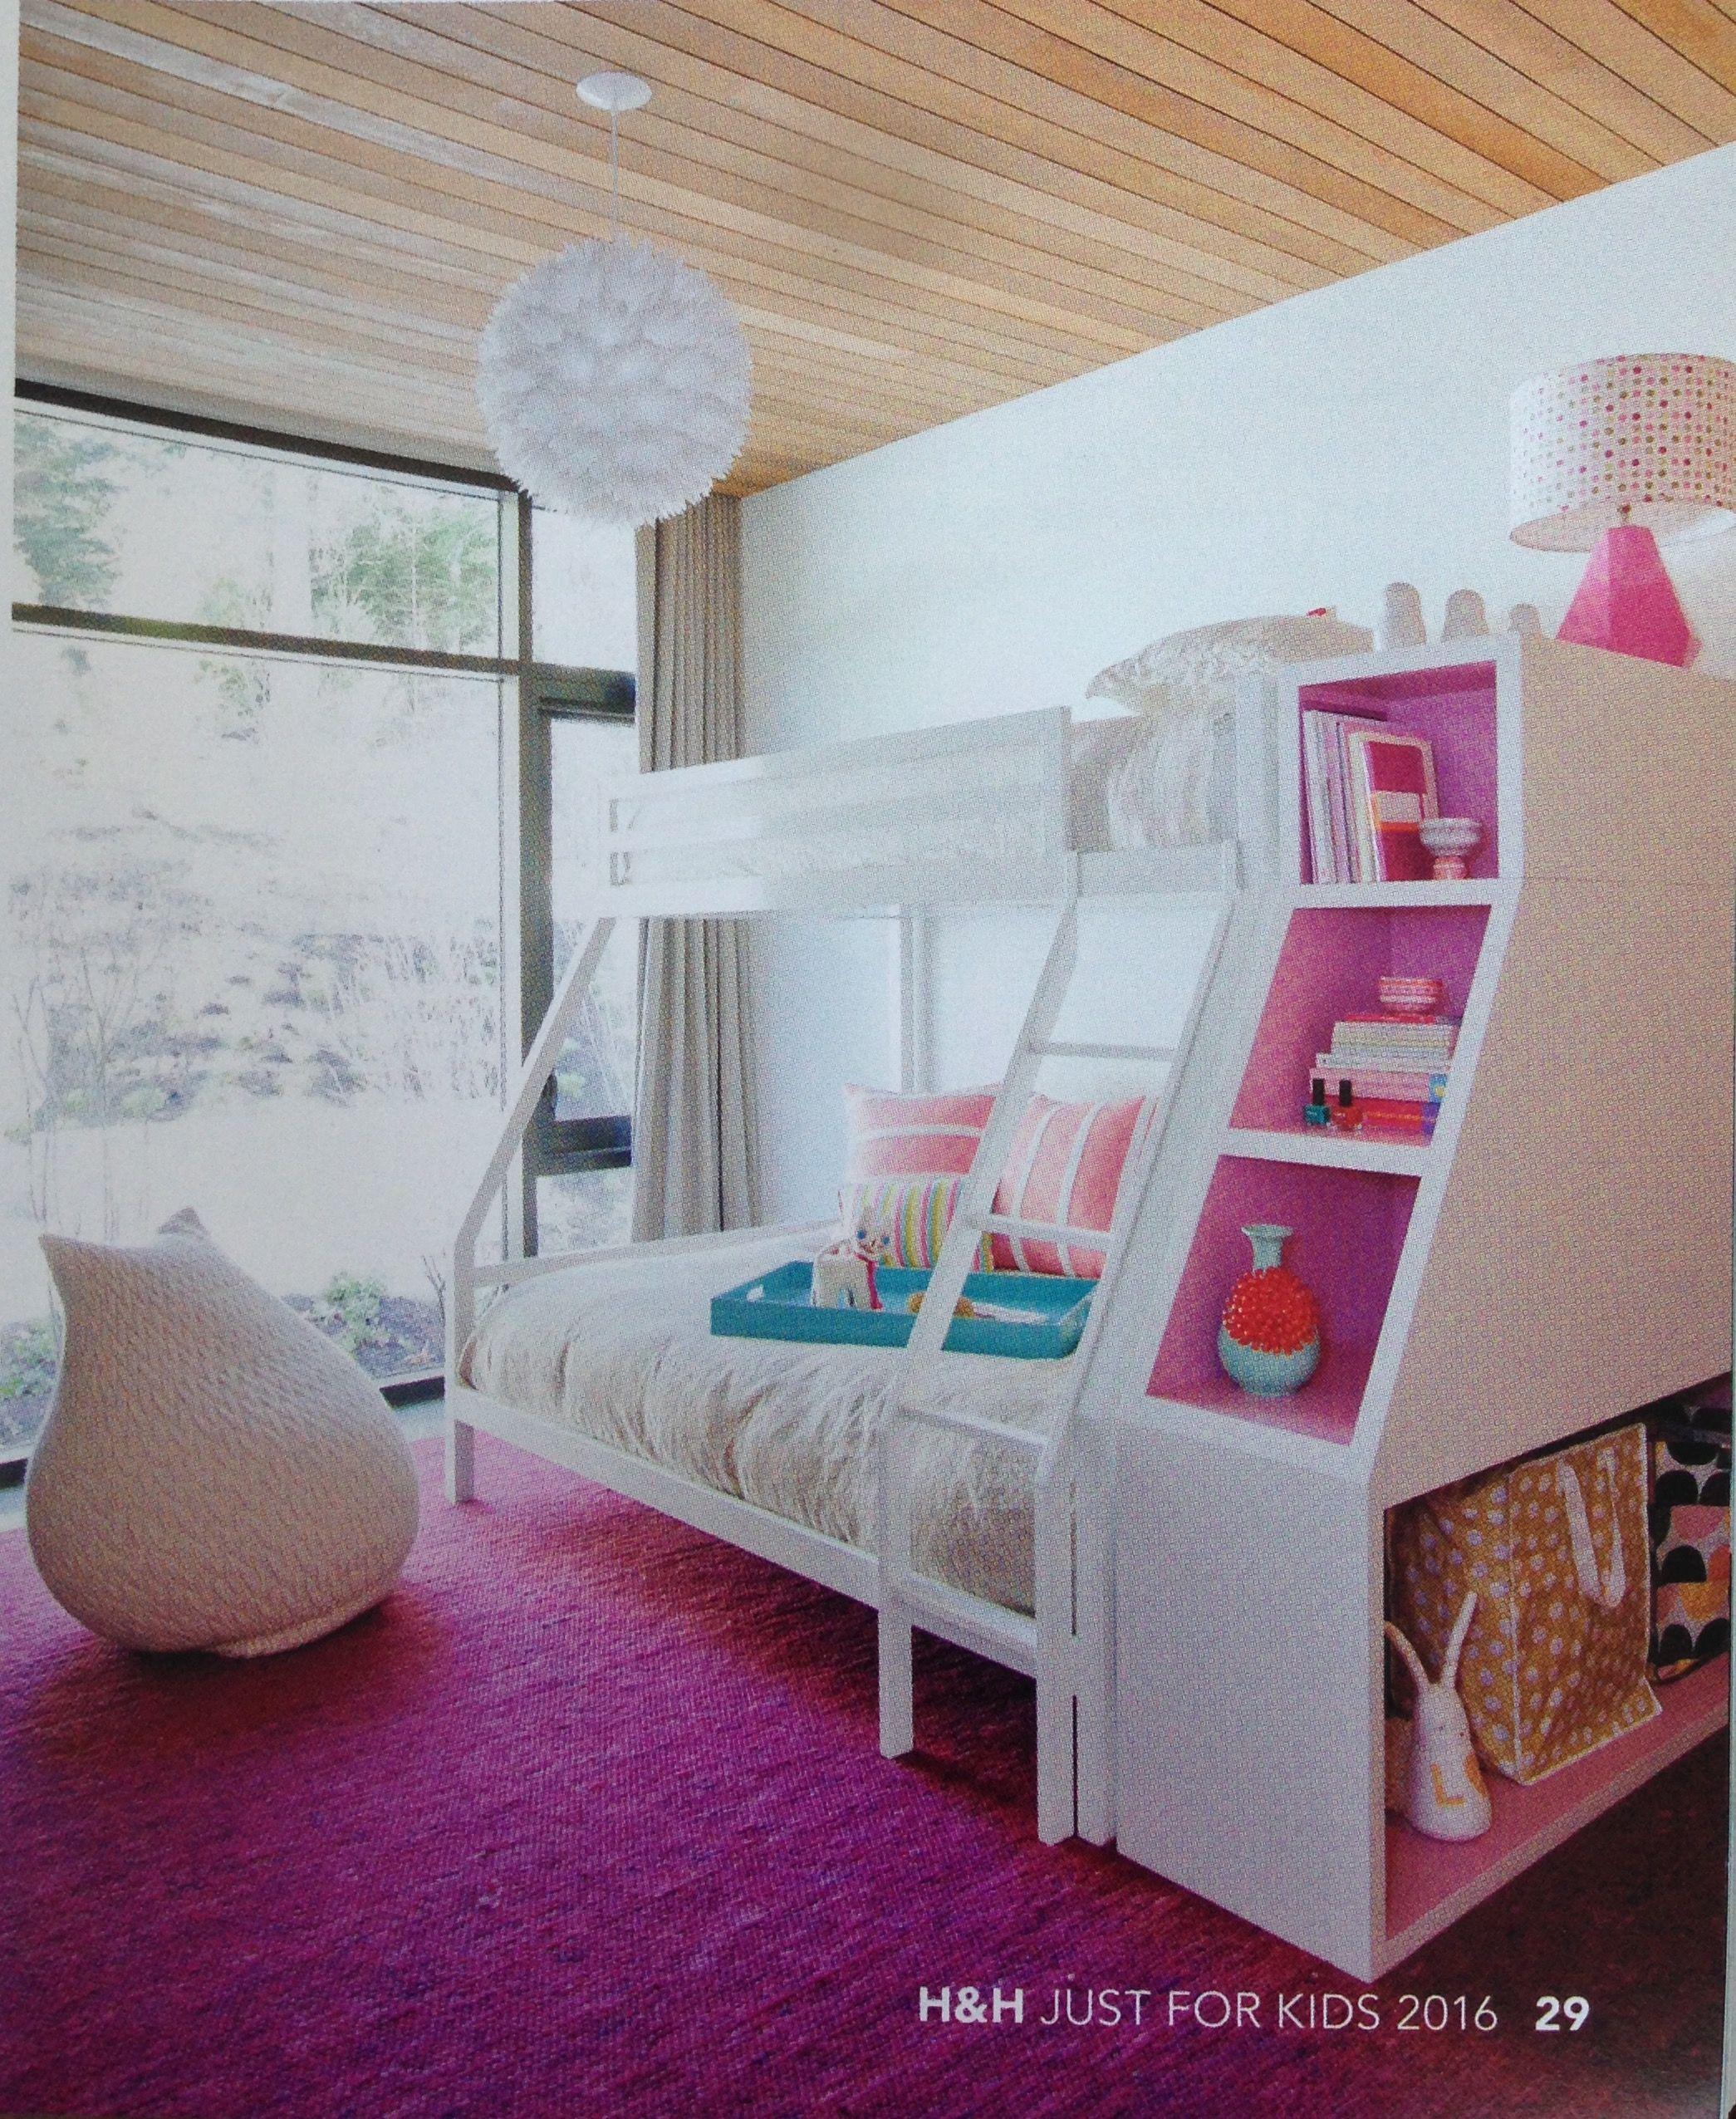 Pin by Cortney Davis on Design.kids Kids room design